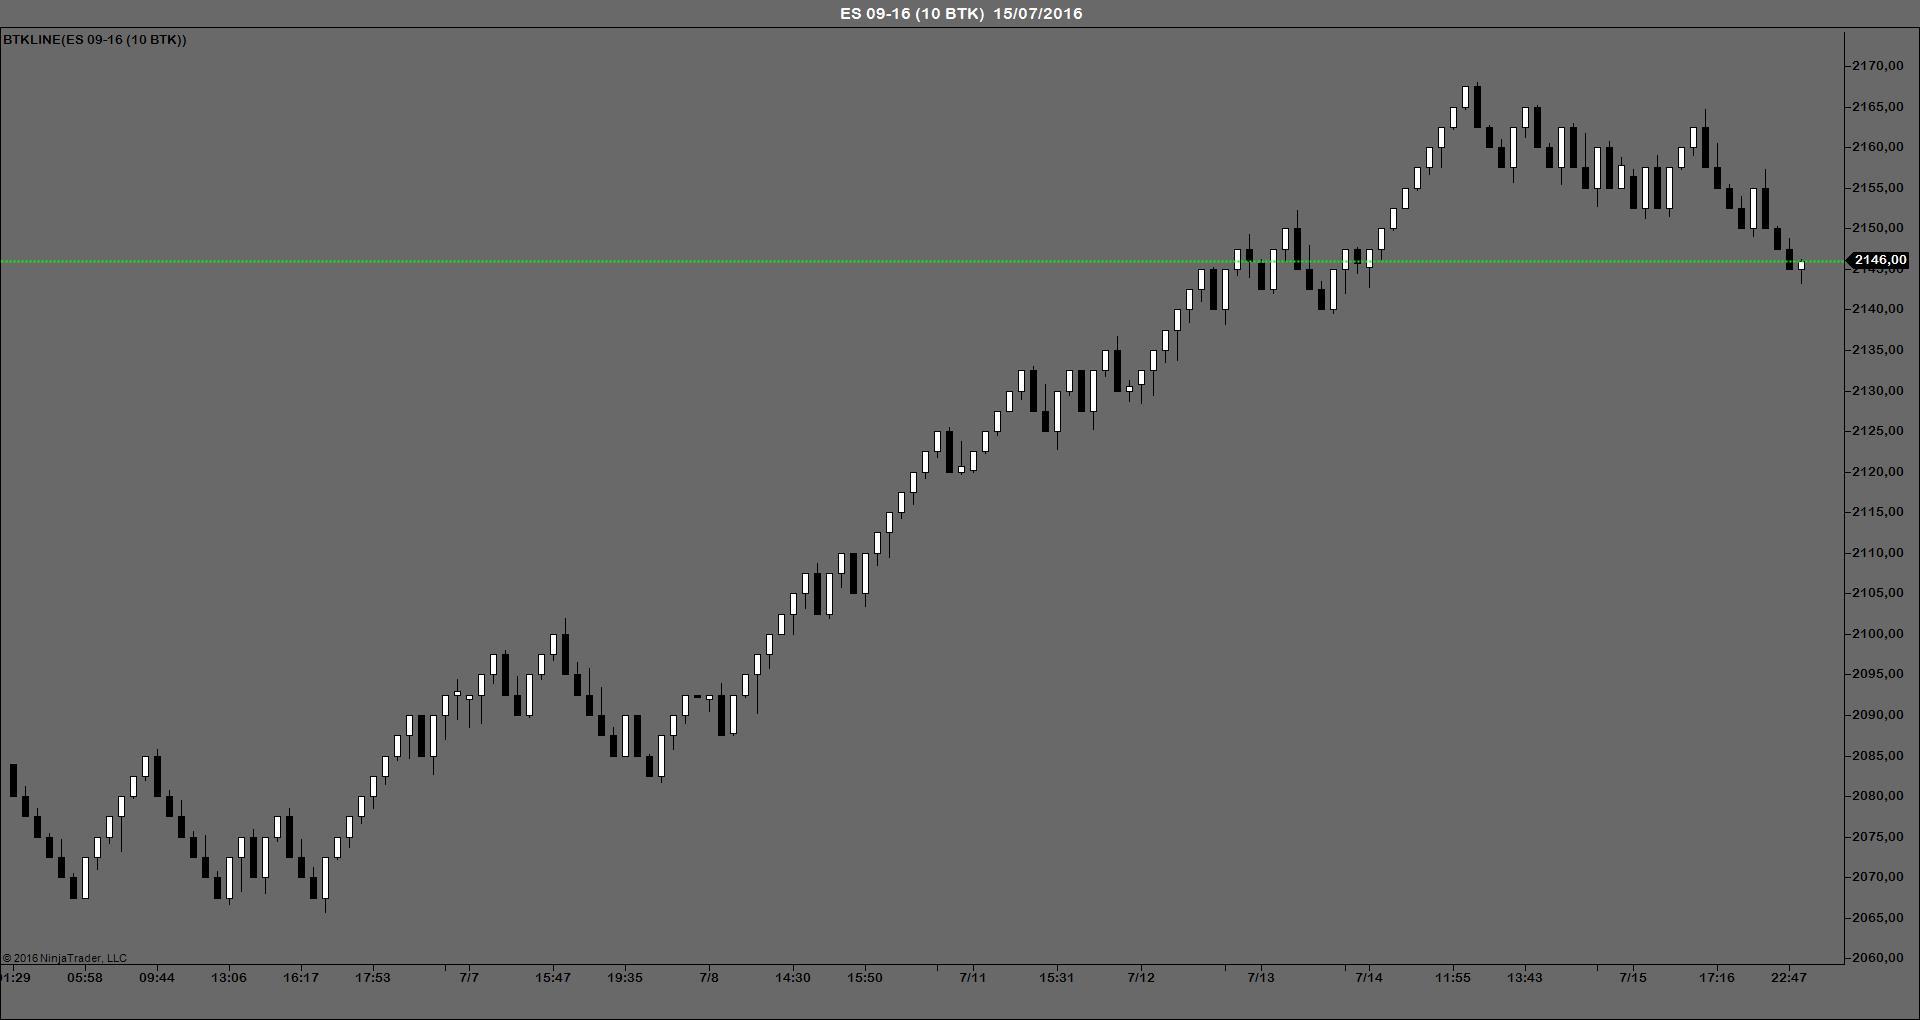 BTKLINE indicador trading